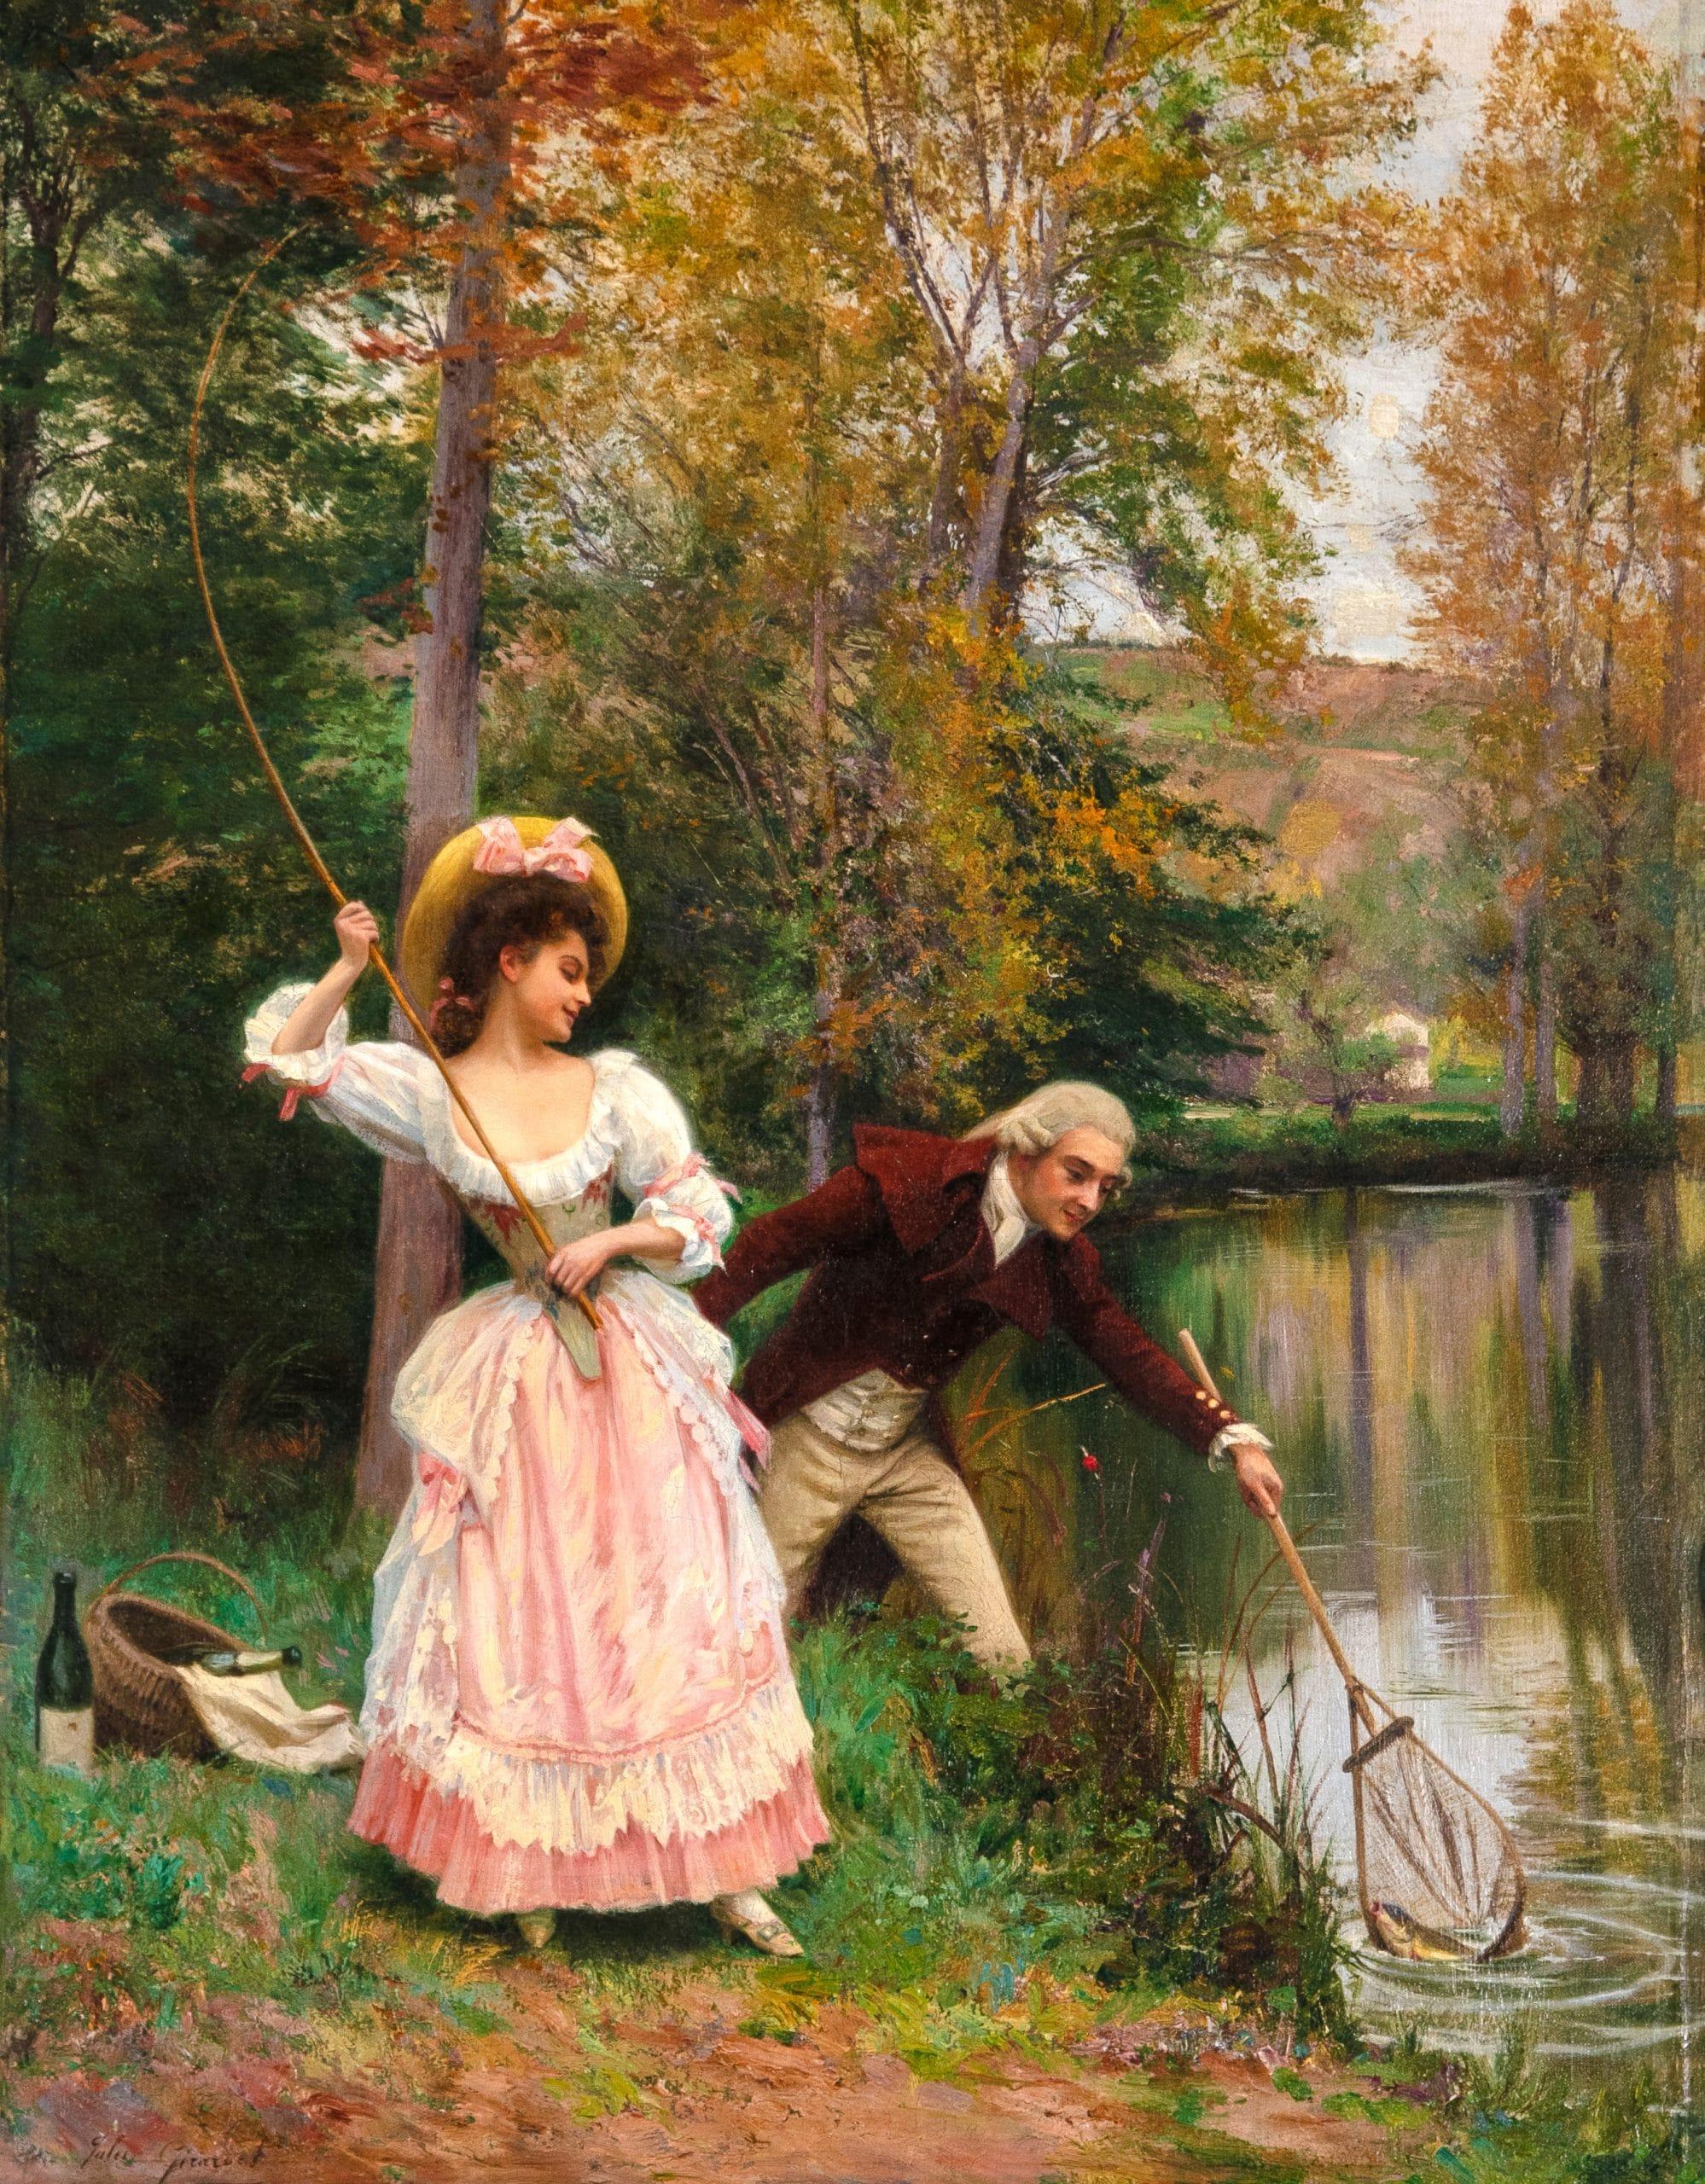 Jules Girardet: Különleges randevú